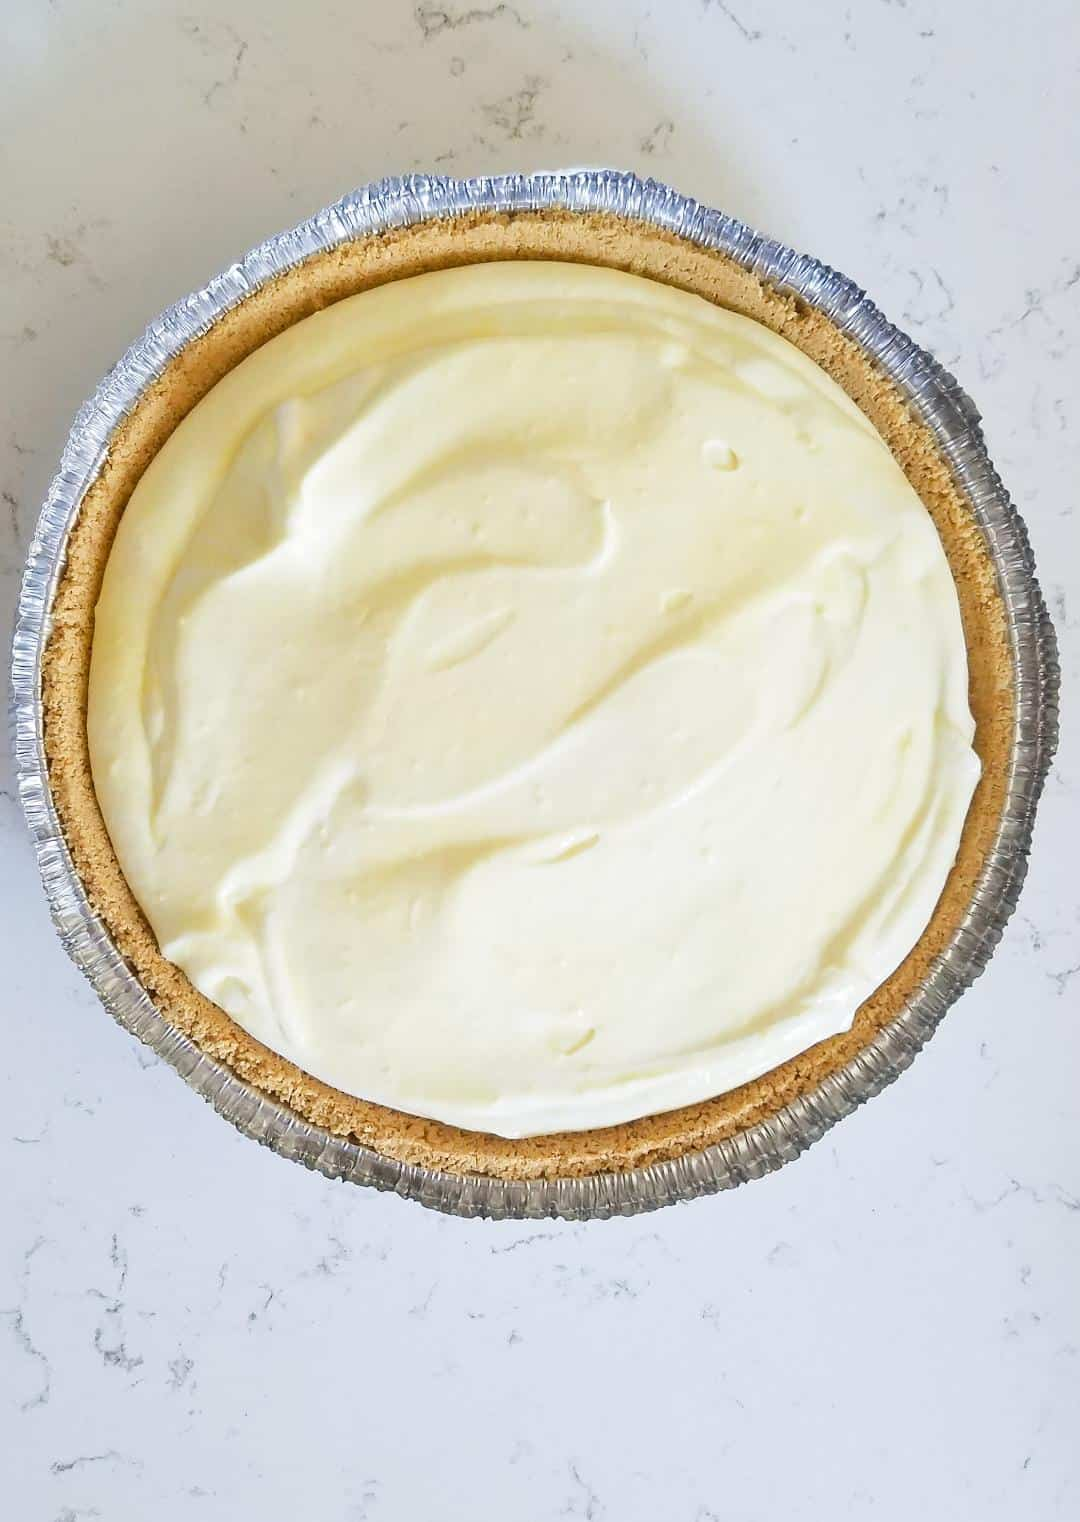 Adding the lemon cream pie filling to the graham cracker pie crust.